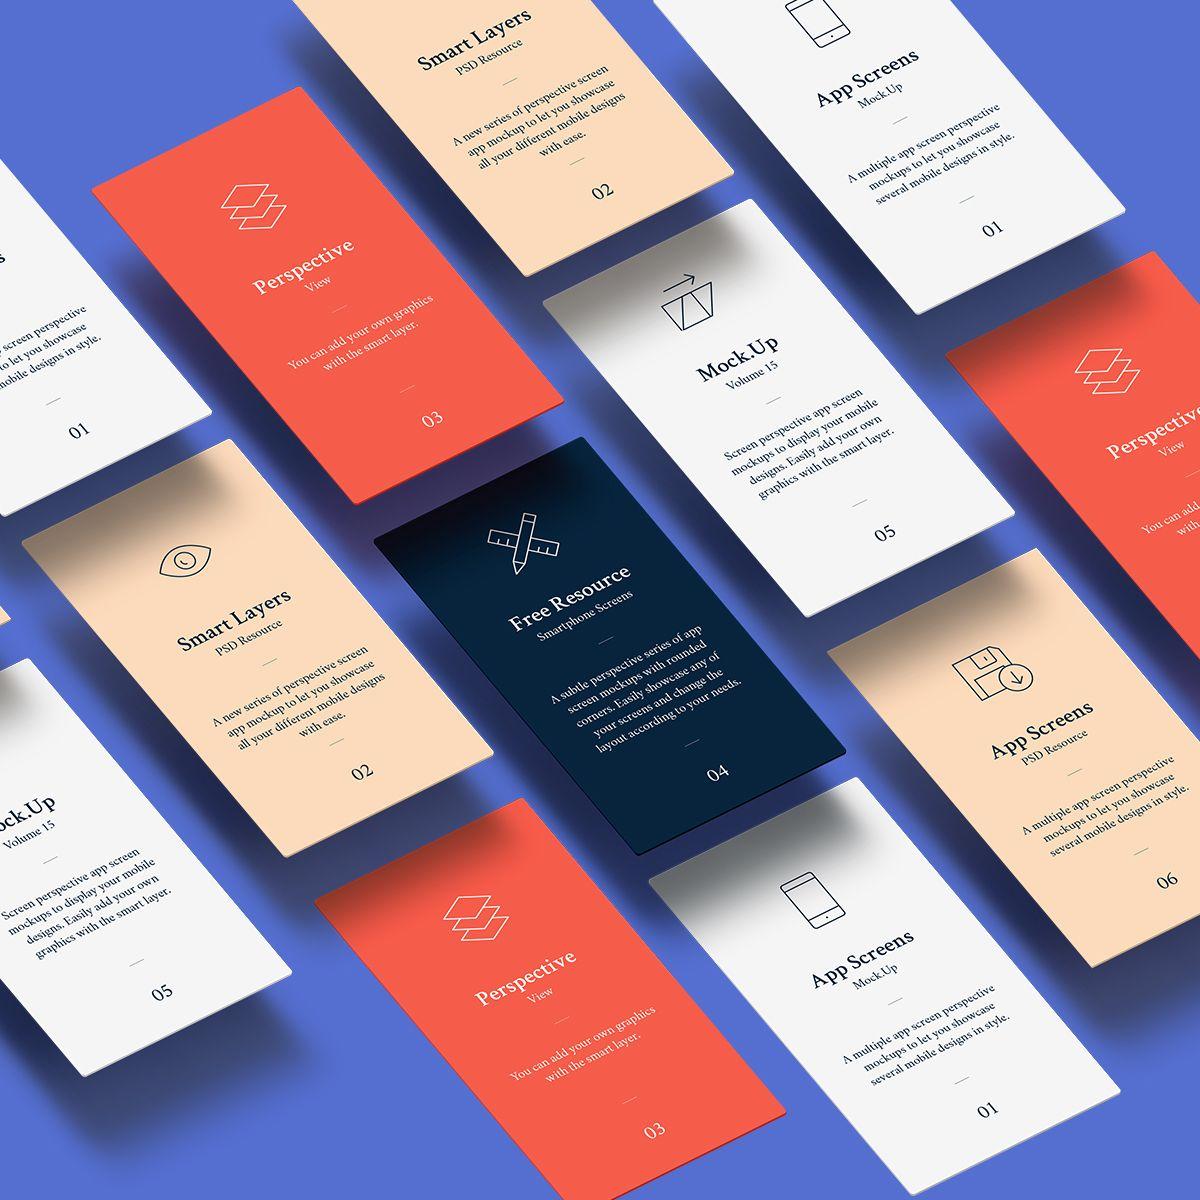 Mobile App Design portfolio4 1200x1200  Home portfolio4 1200x1200